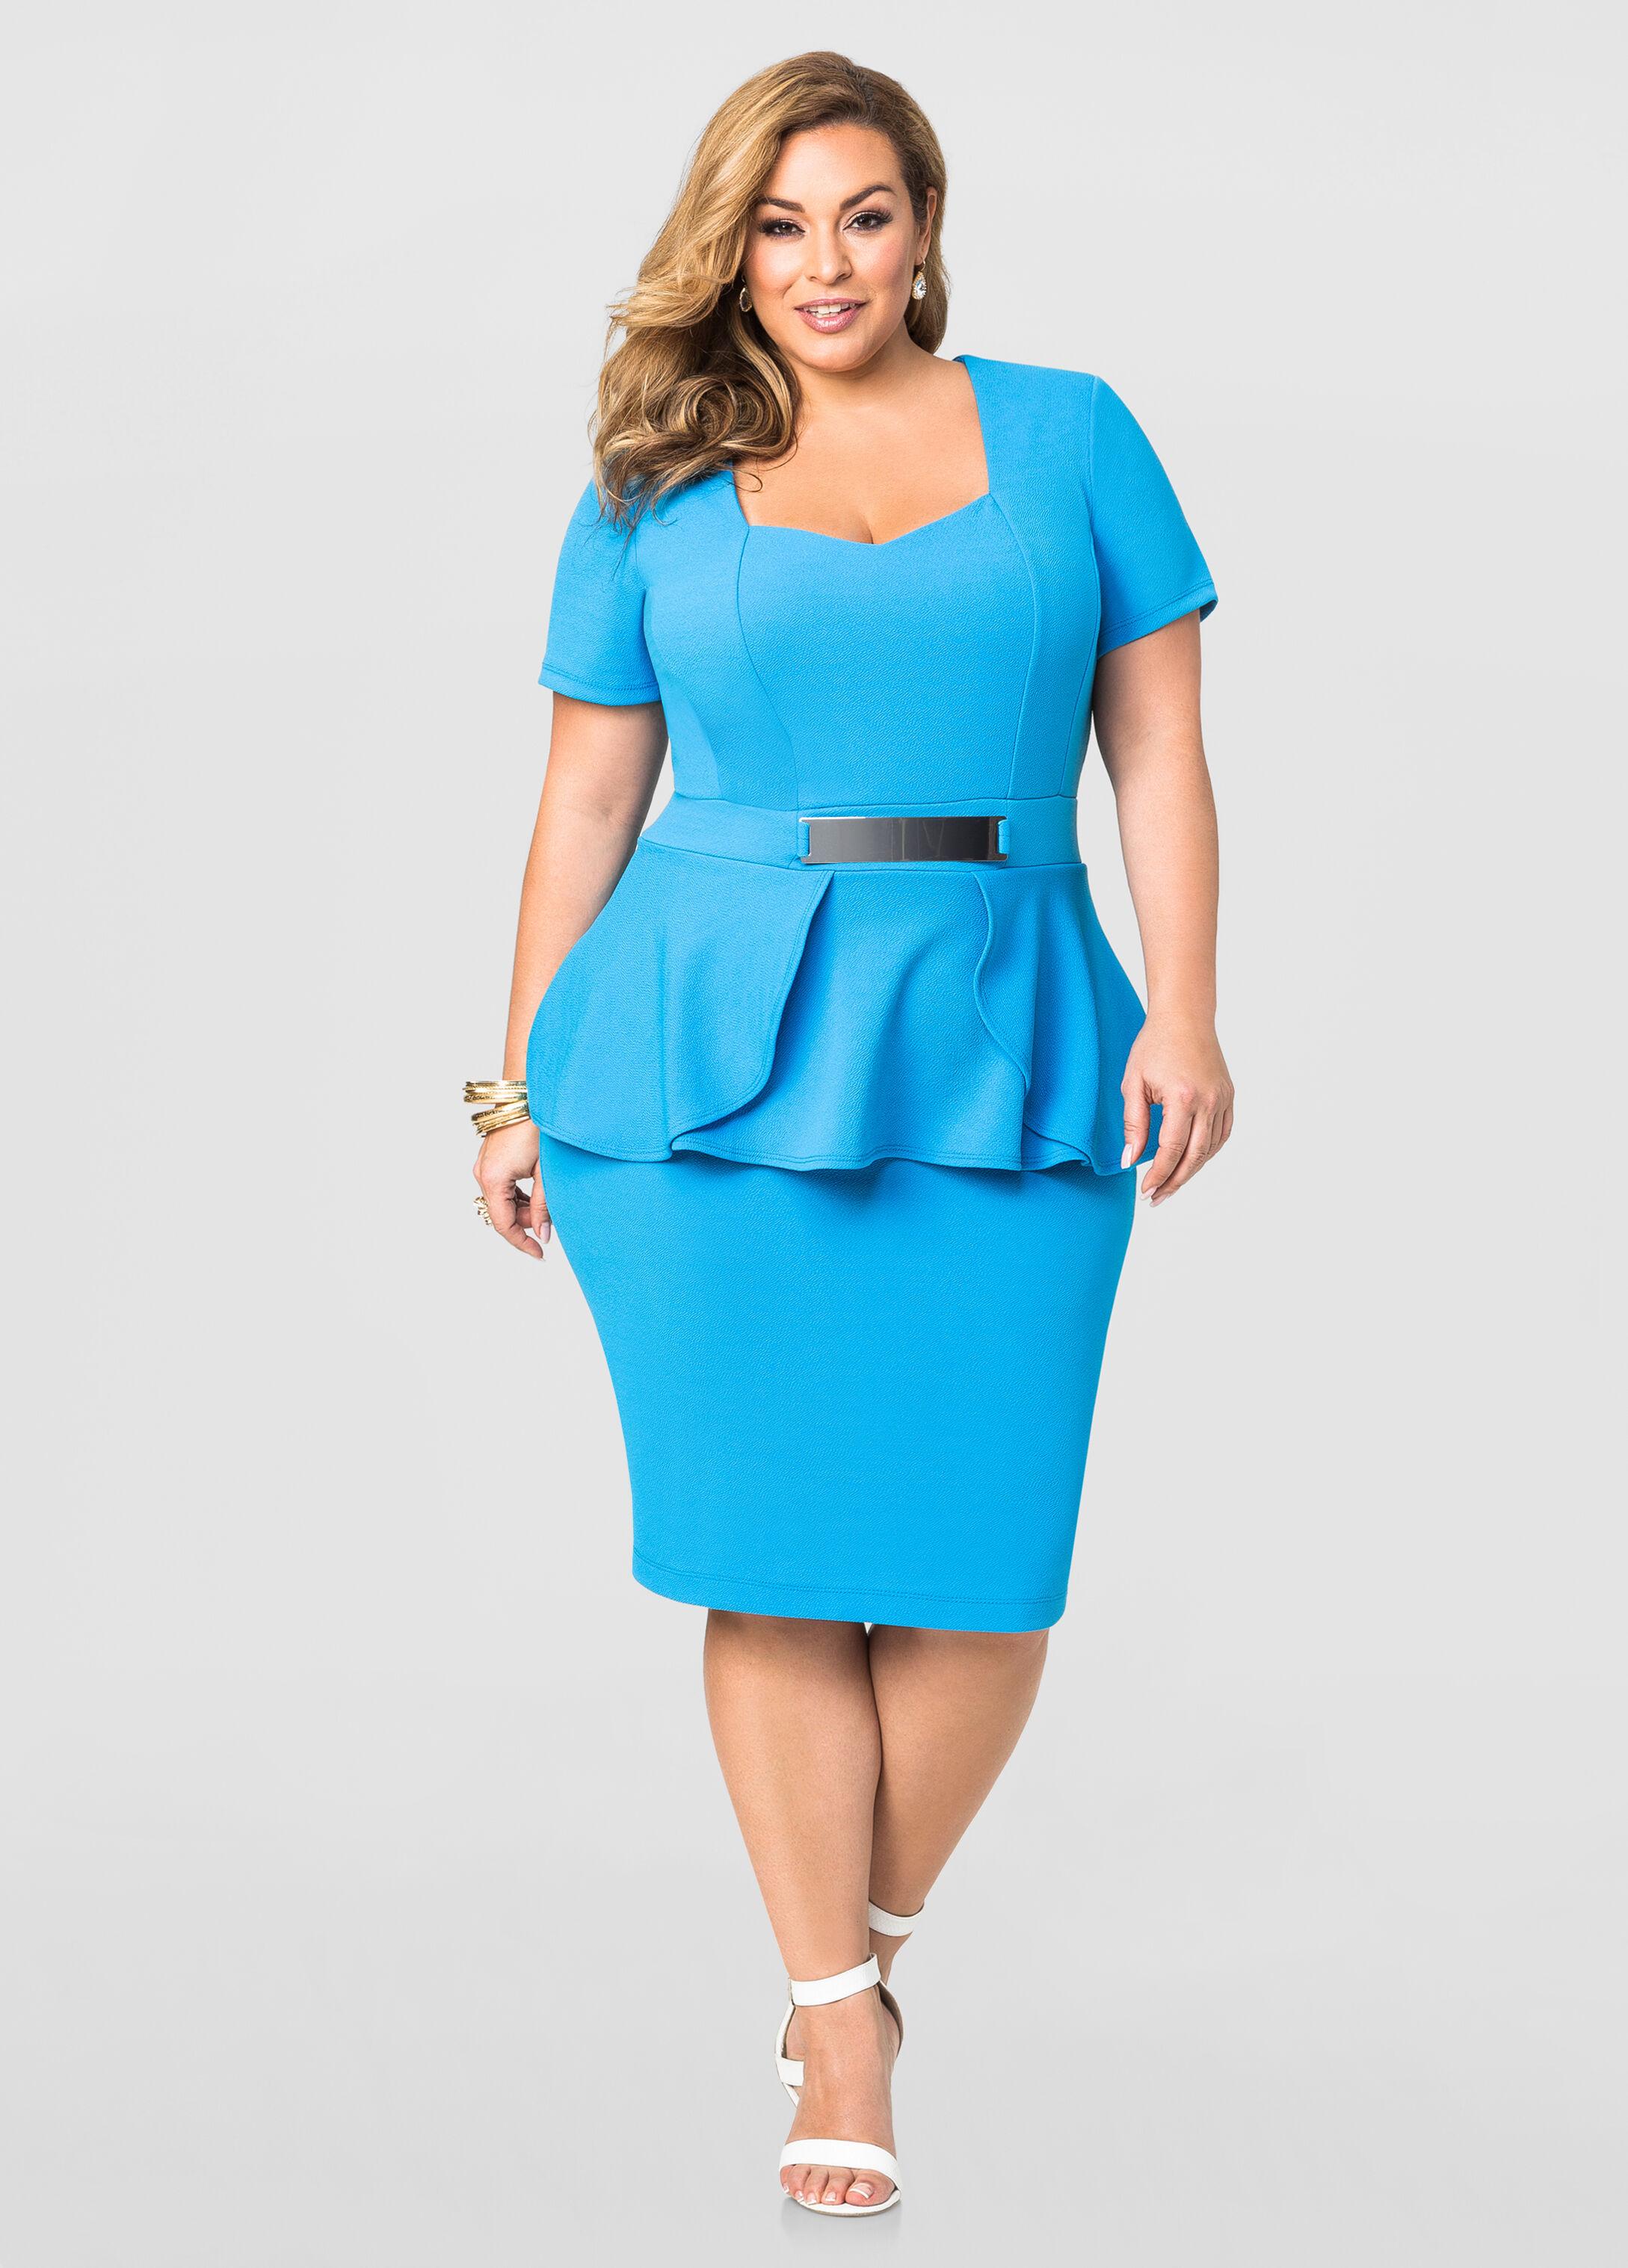 Gold Plate Peplum Dress-Plus Size Dresses-Ashley Stewart-010-11269X